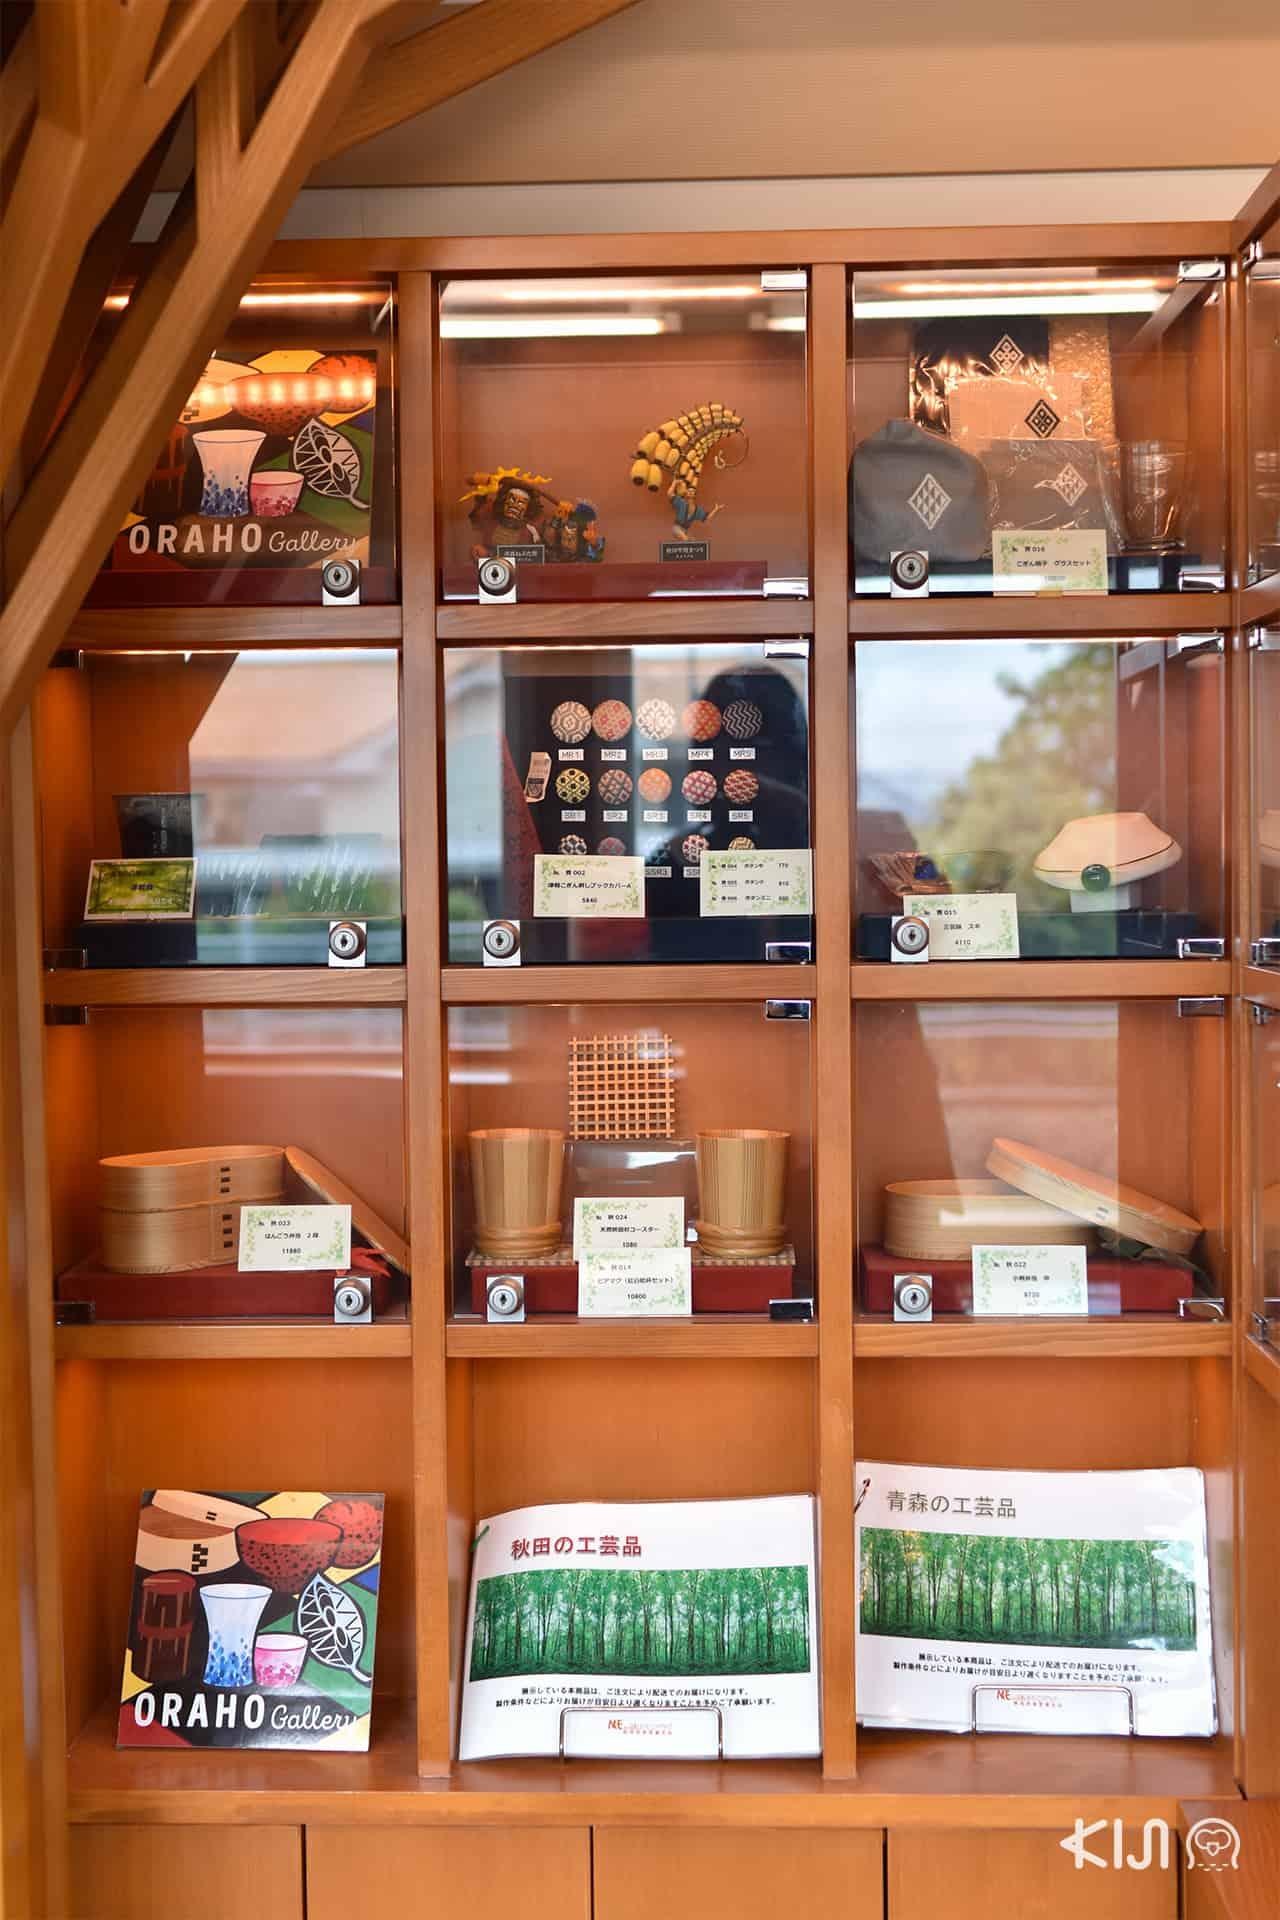 JR East Pass Tohoku Area - ของที่ระลึกภายในรถไฟ Joyful Train (Resort Shirakami)